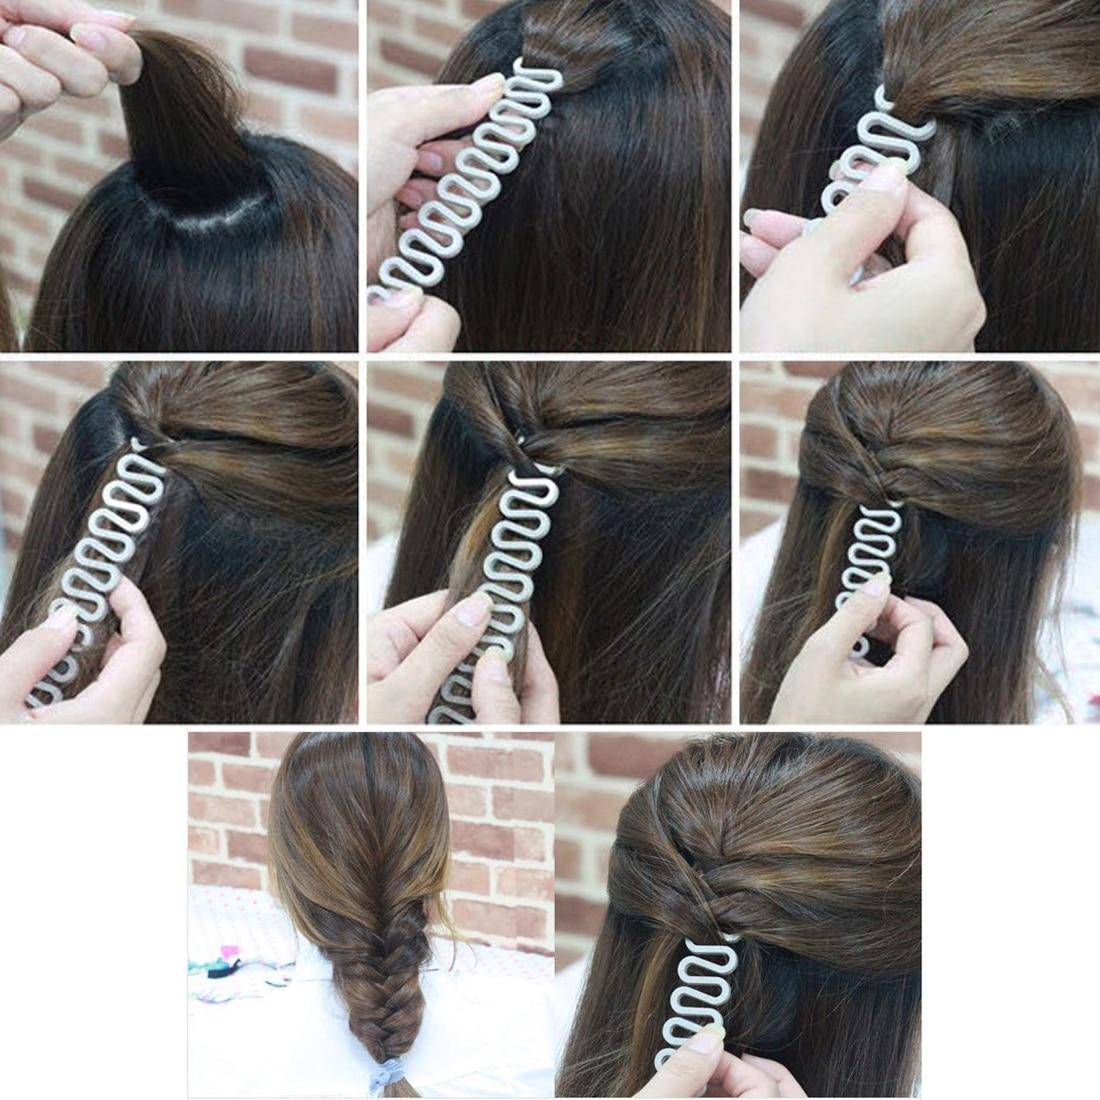 Big/Small Hair Braiding Tool Fish Bone Braider Roller Twist Styling Bun Maker Weave Roller Band Hair Styling Hairdressing Accs